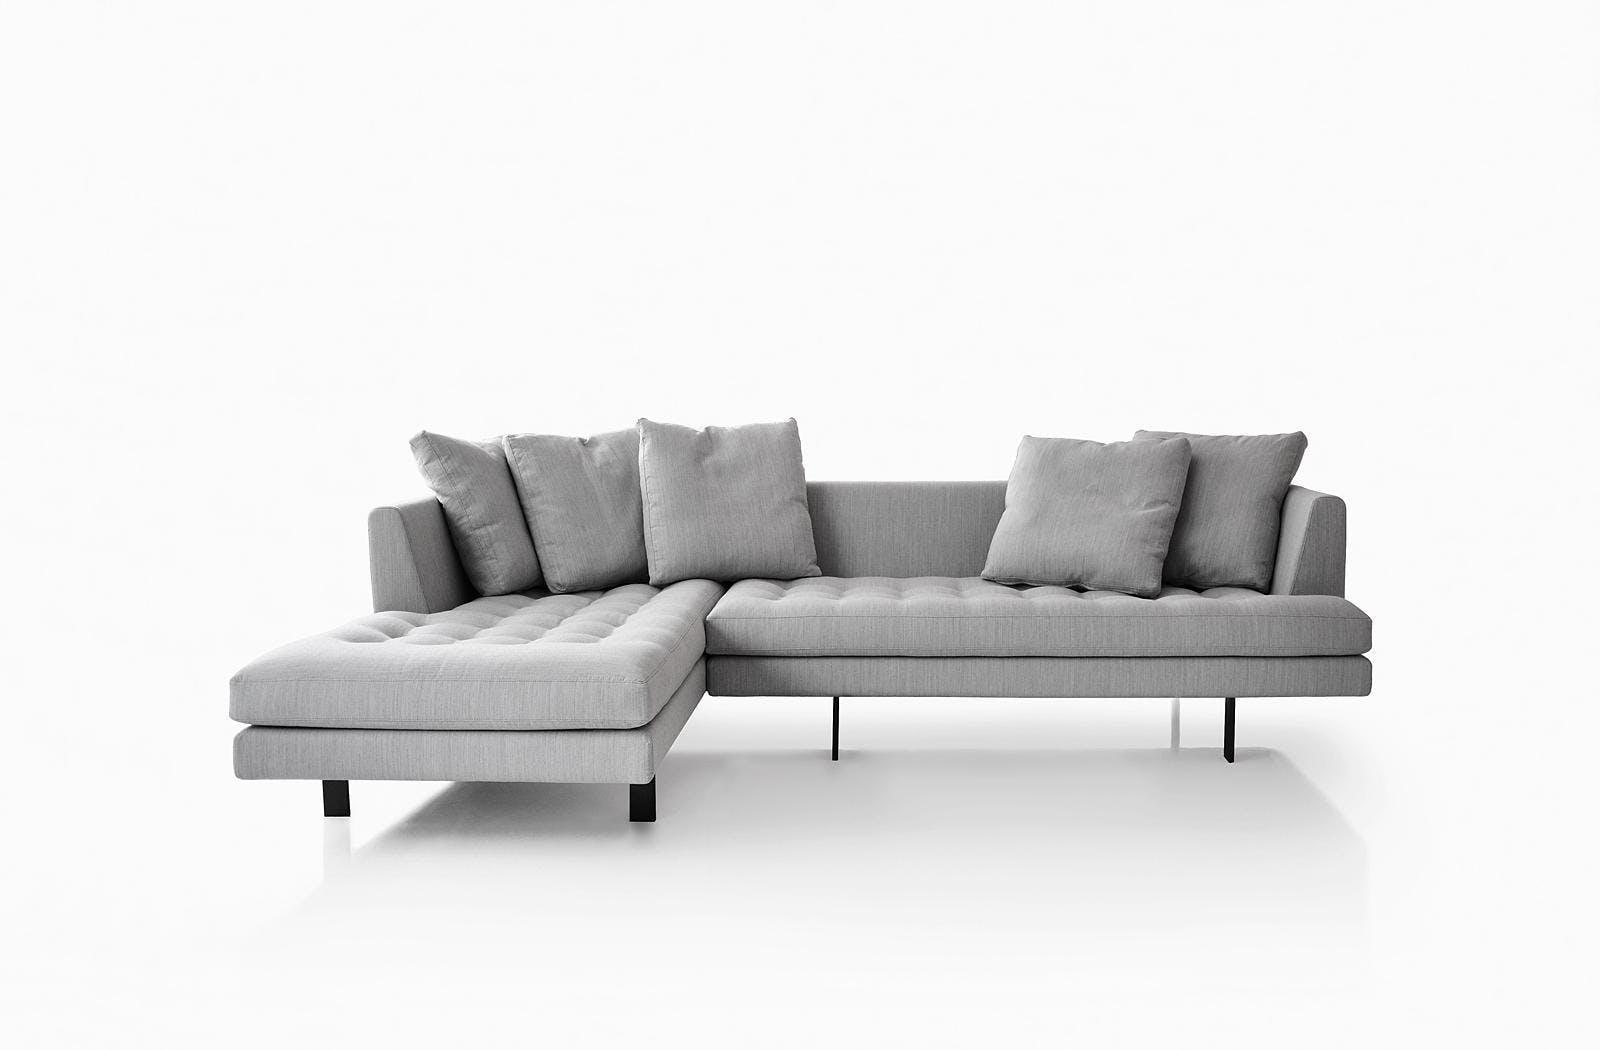 Bensen Grey Edward Sectional Sofa Front